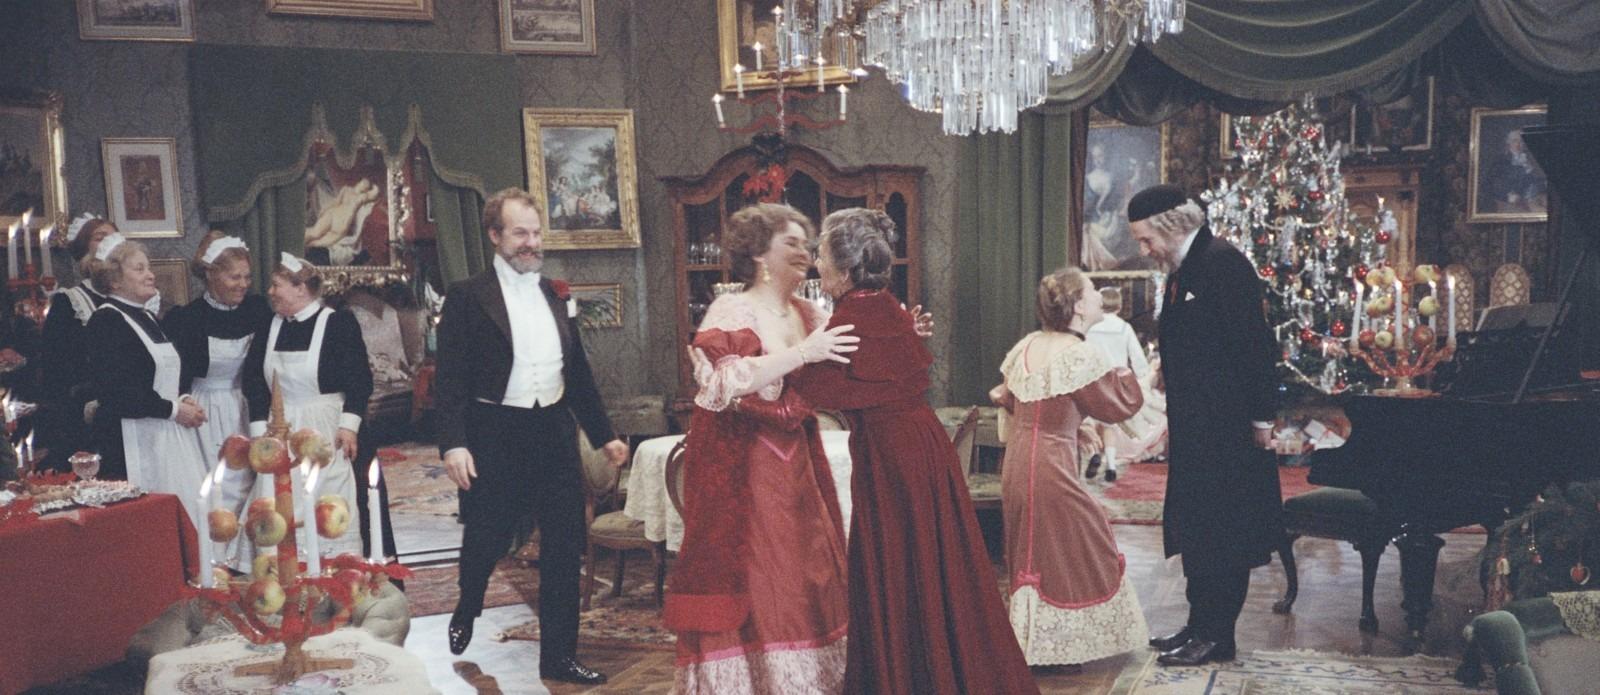 Fanny and Alexander, Fanija un Aleksandrs